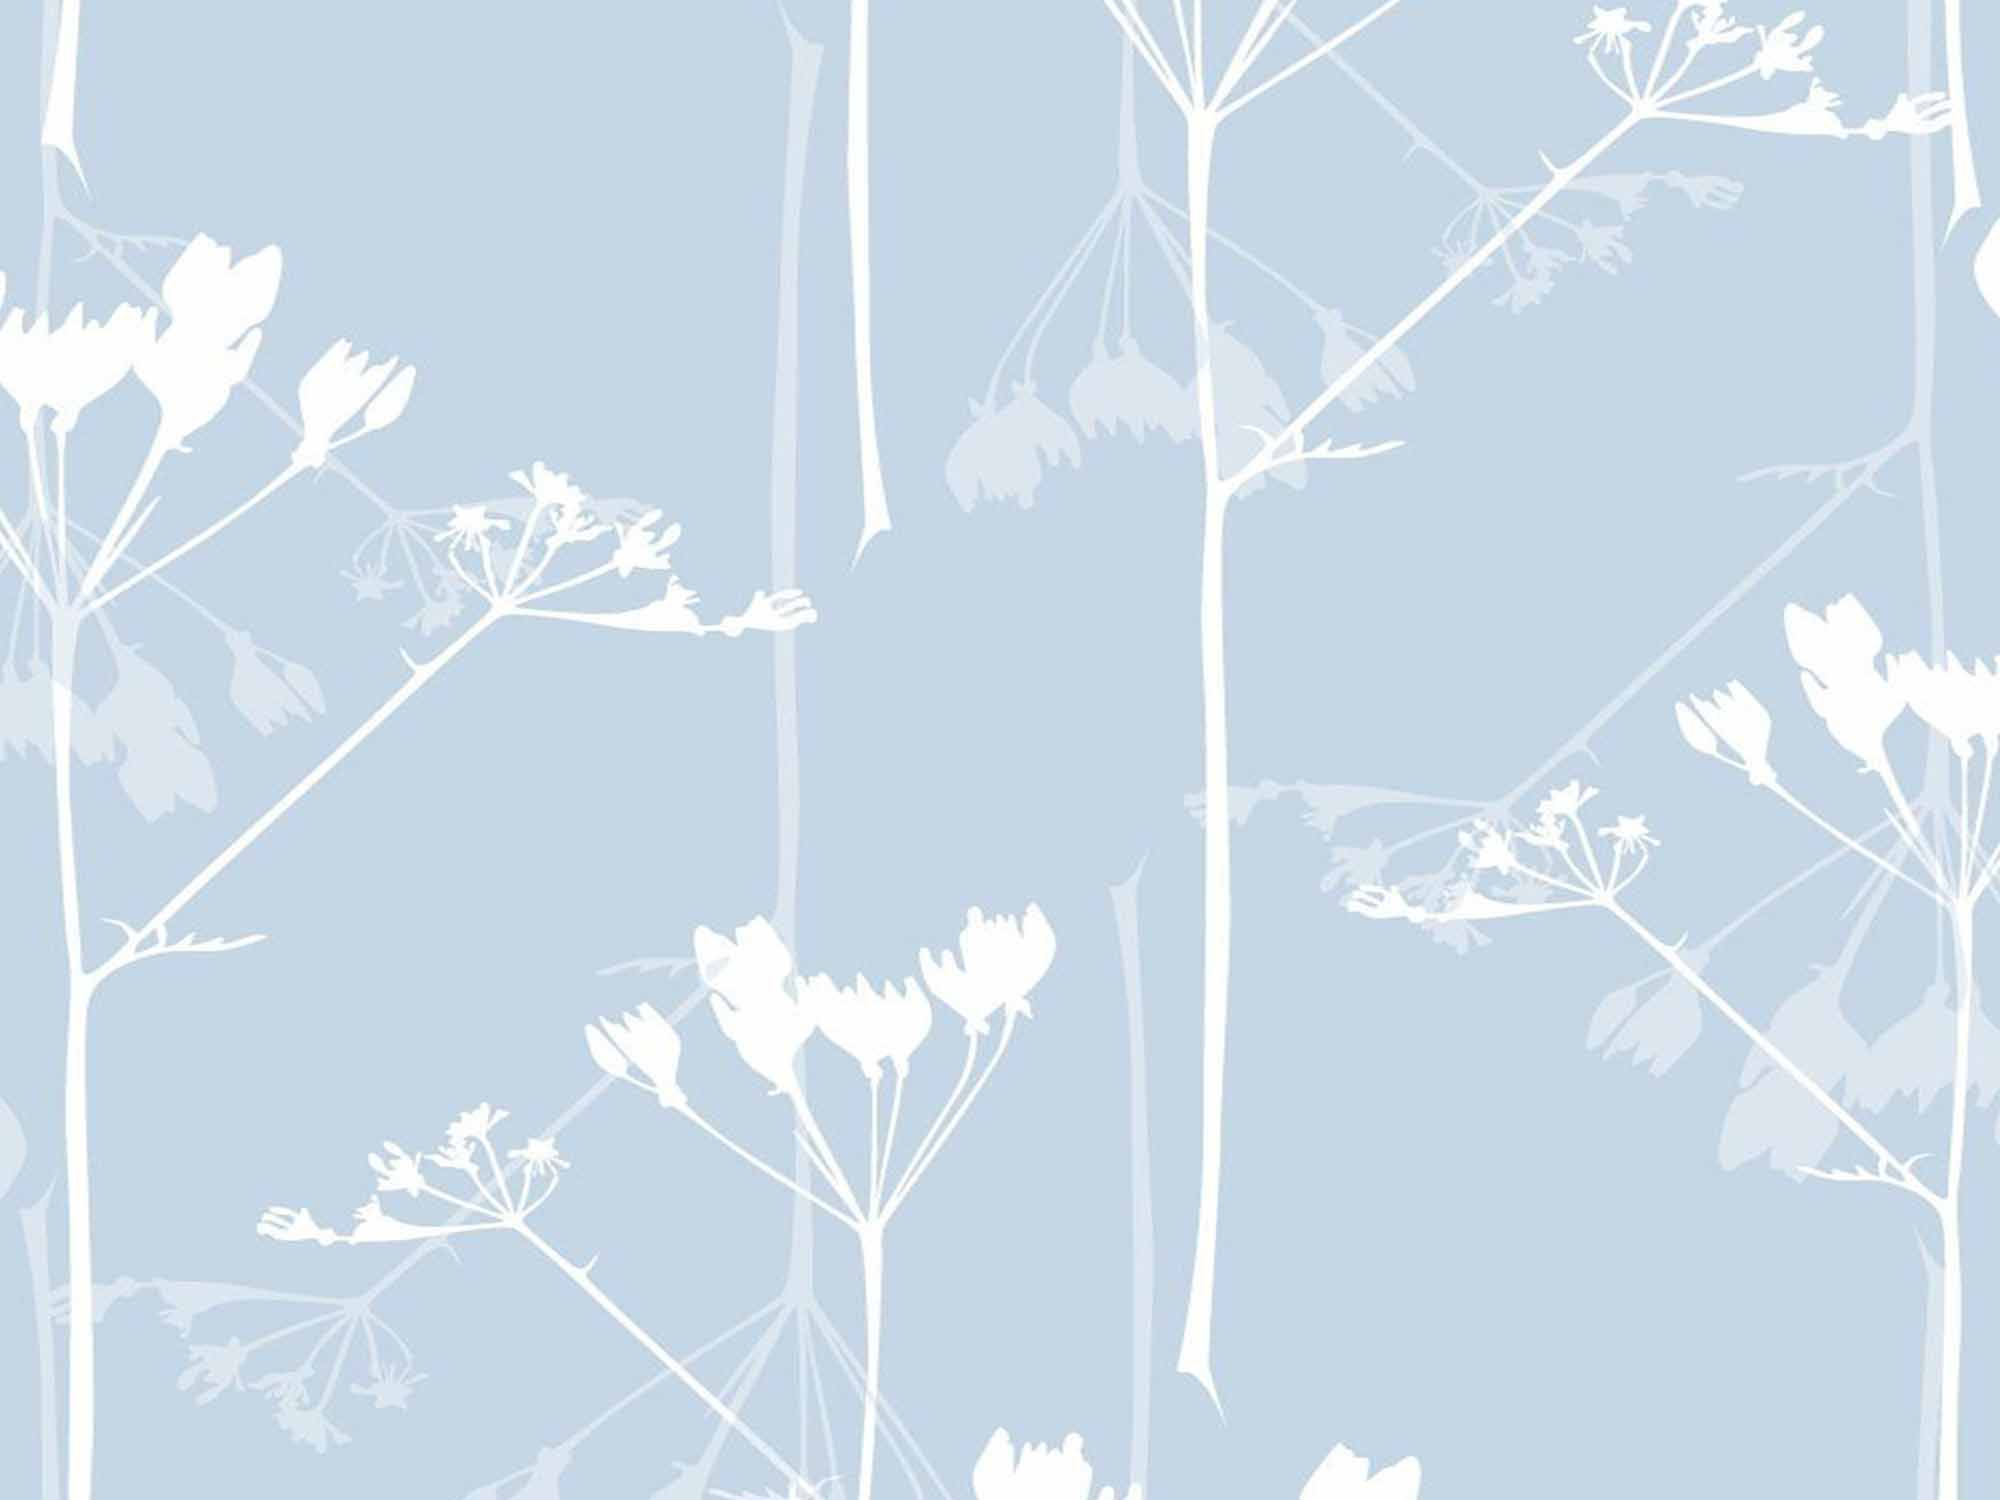 Papel de Parede Floral 0070 - Adesivos de Parede  - Paredes Decoradas